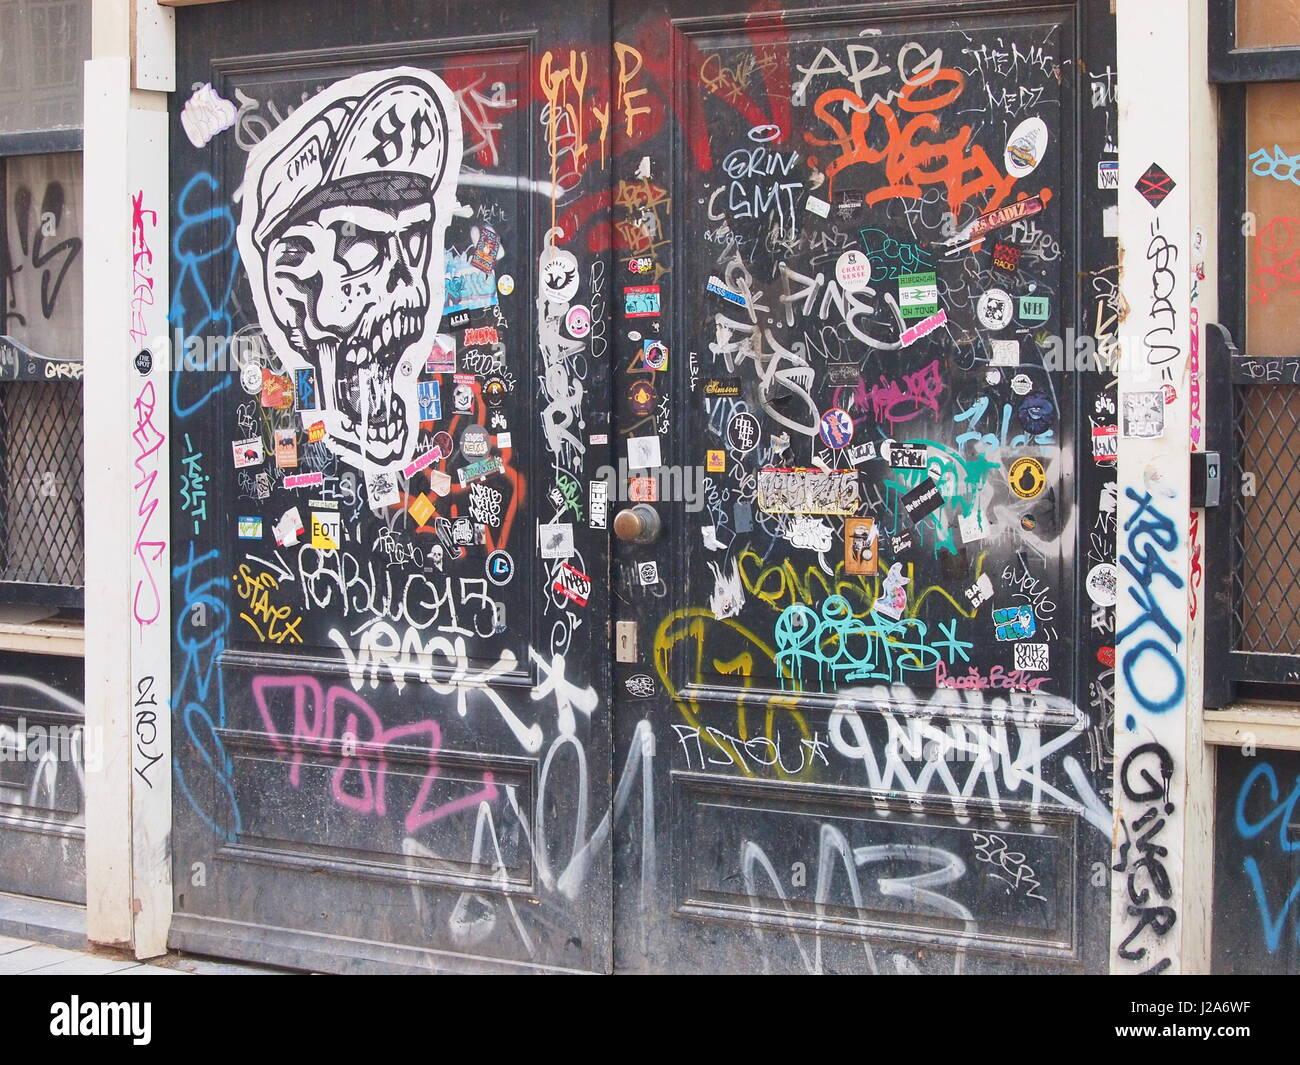 Graffiti wall amsterdam - Graffiti Wall Amsterdam Stock Image